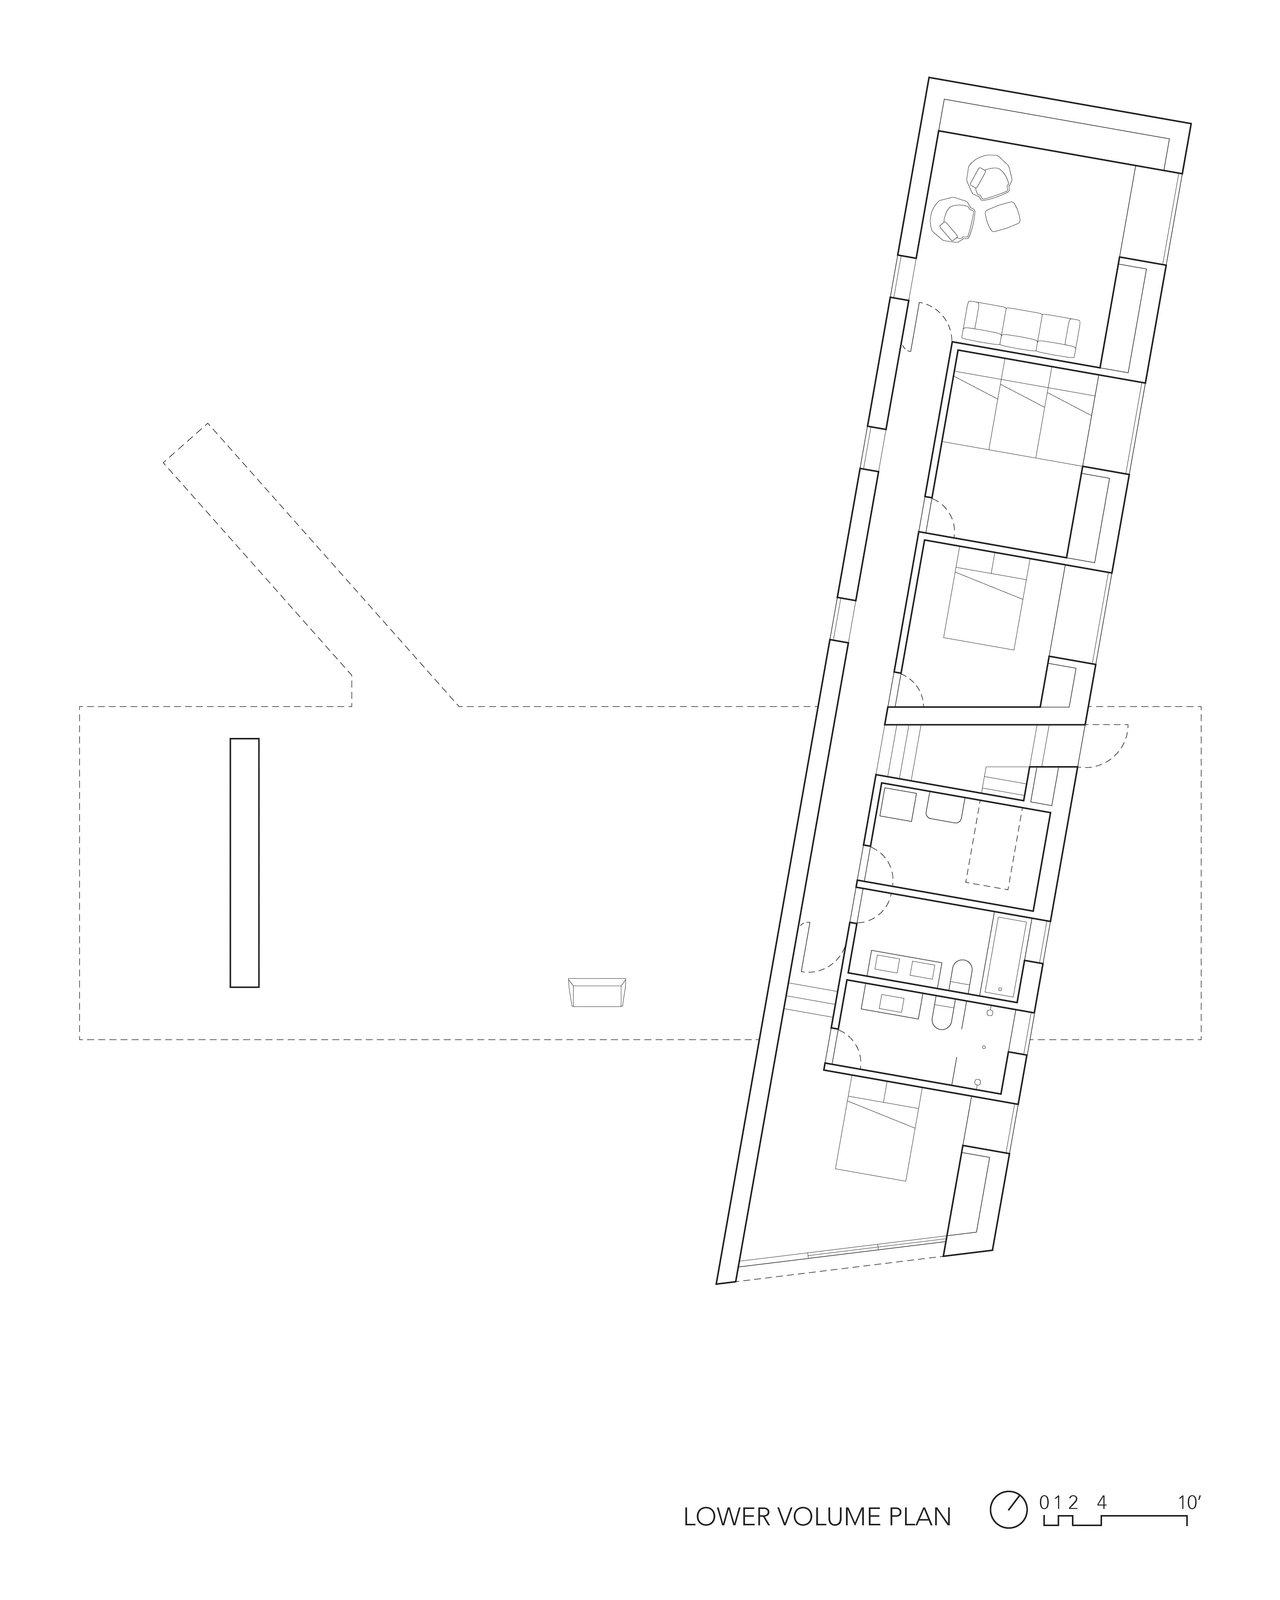 Floorplan for the lower volume.